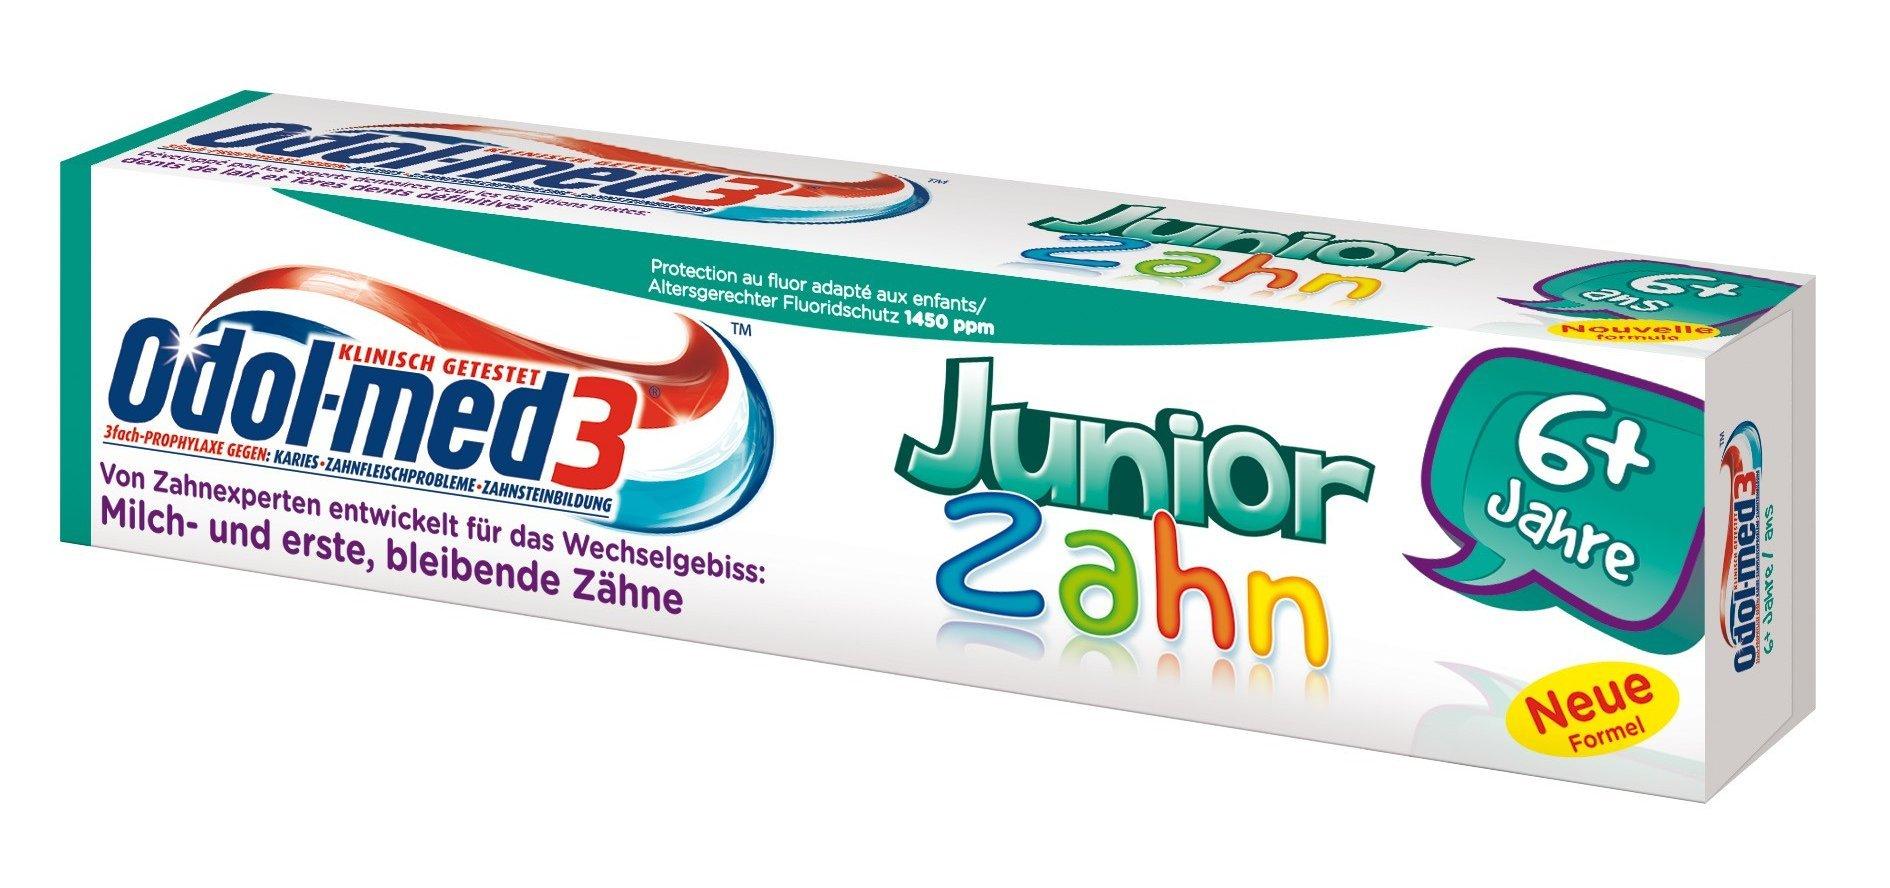 Odol-med 3 Junior 6+ Years Mild Fresh Flavor 50ml